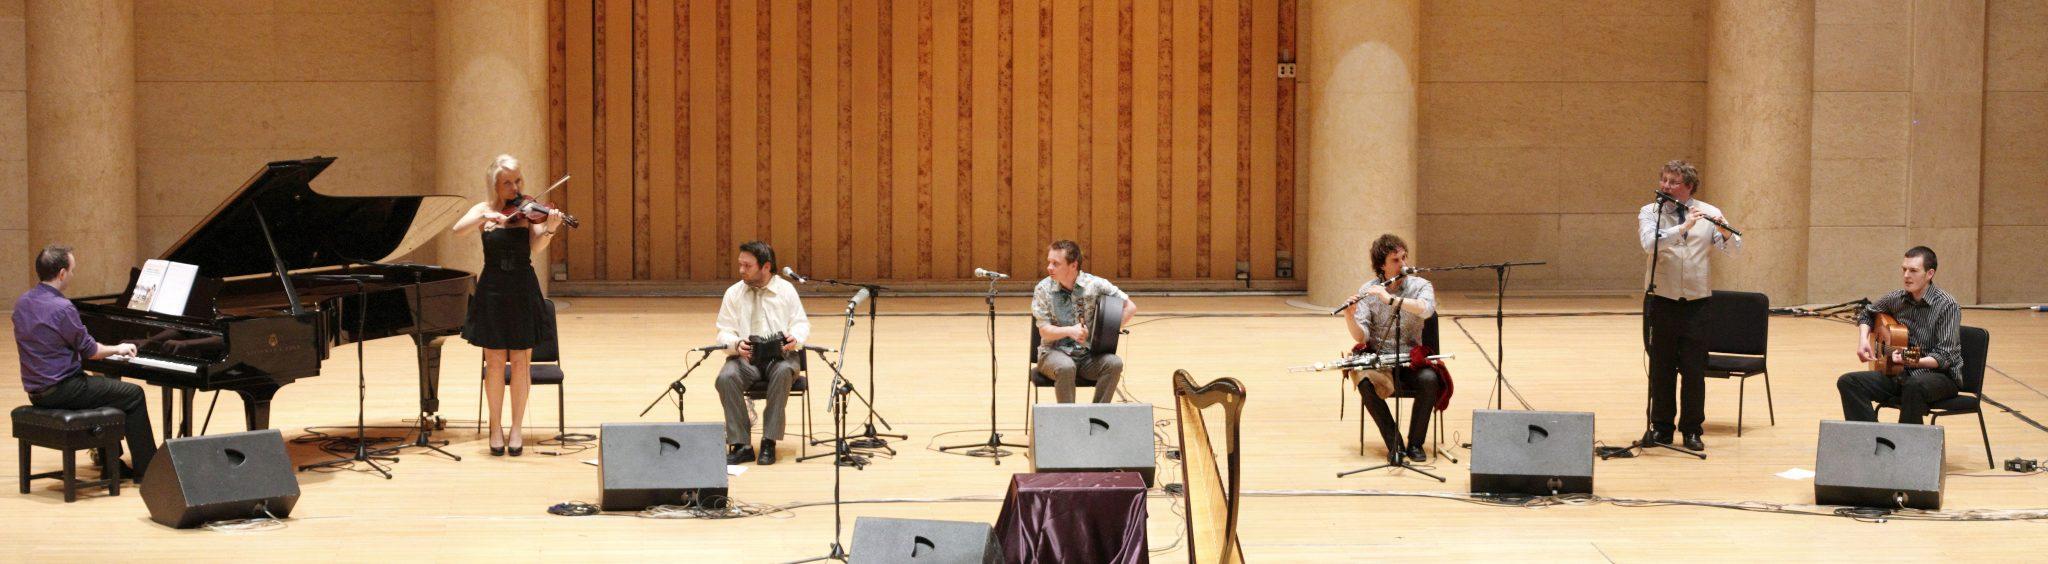 Ciorras at The Forbidden City Concert Hall, Beijing